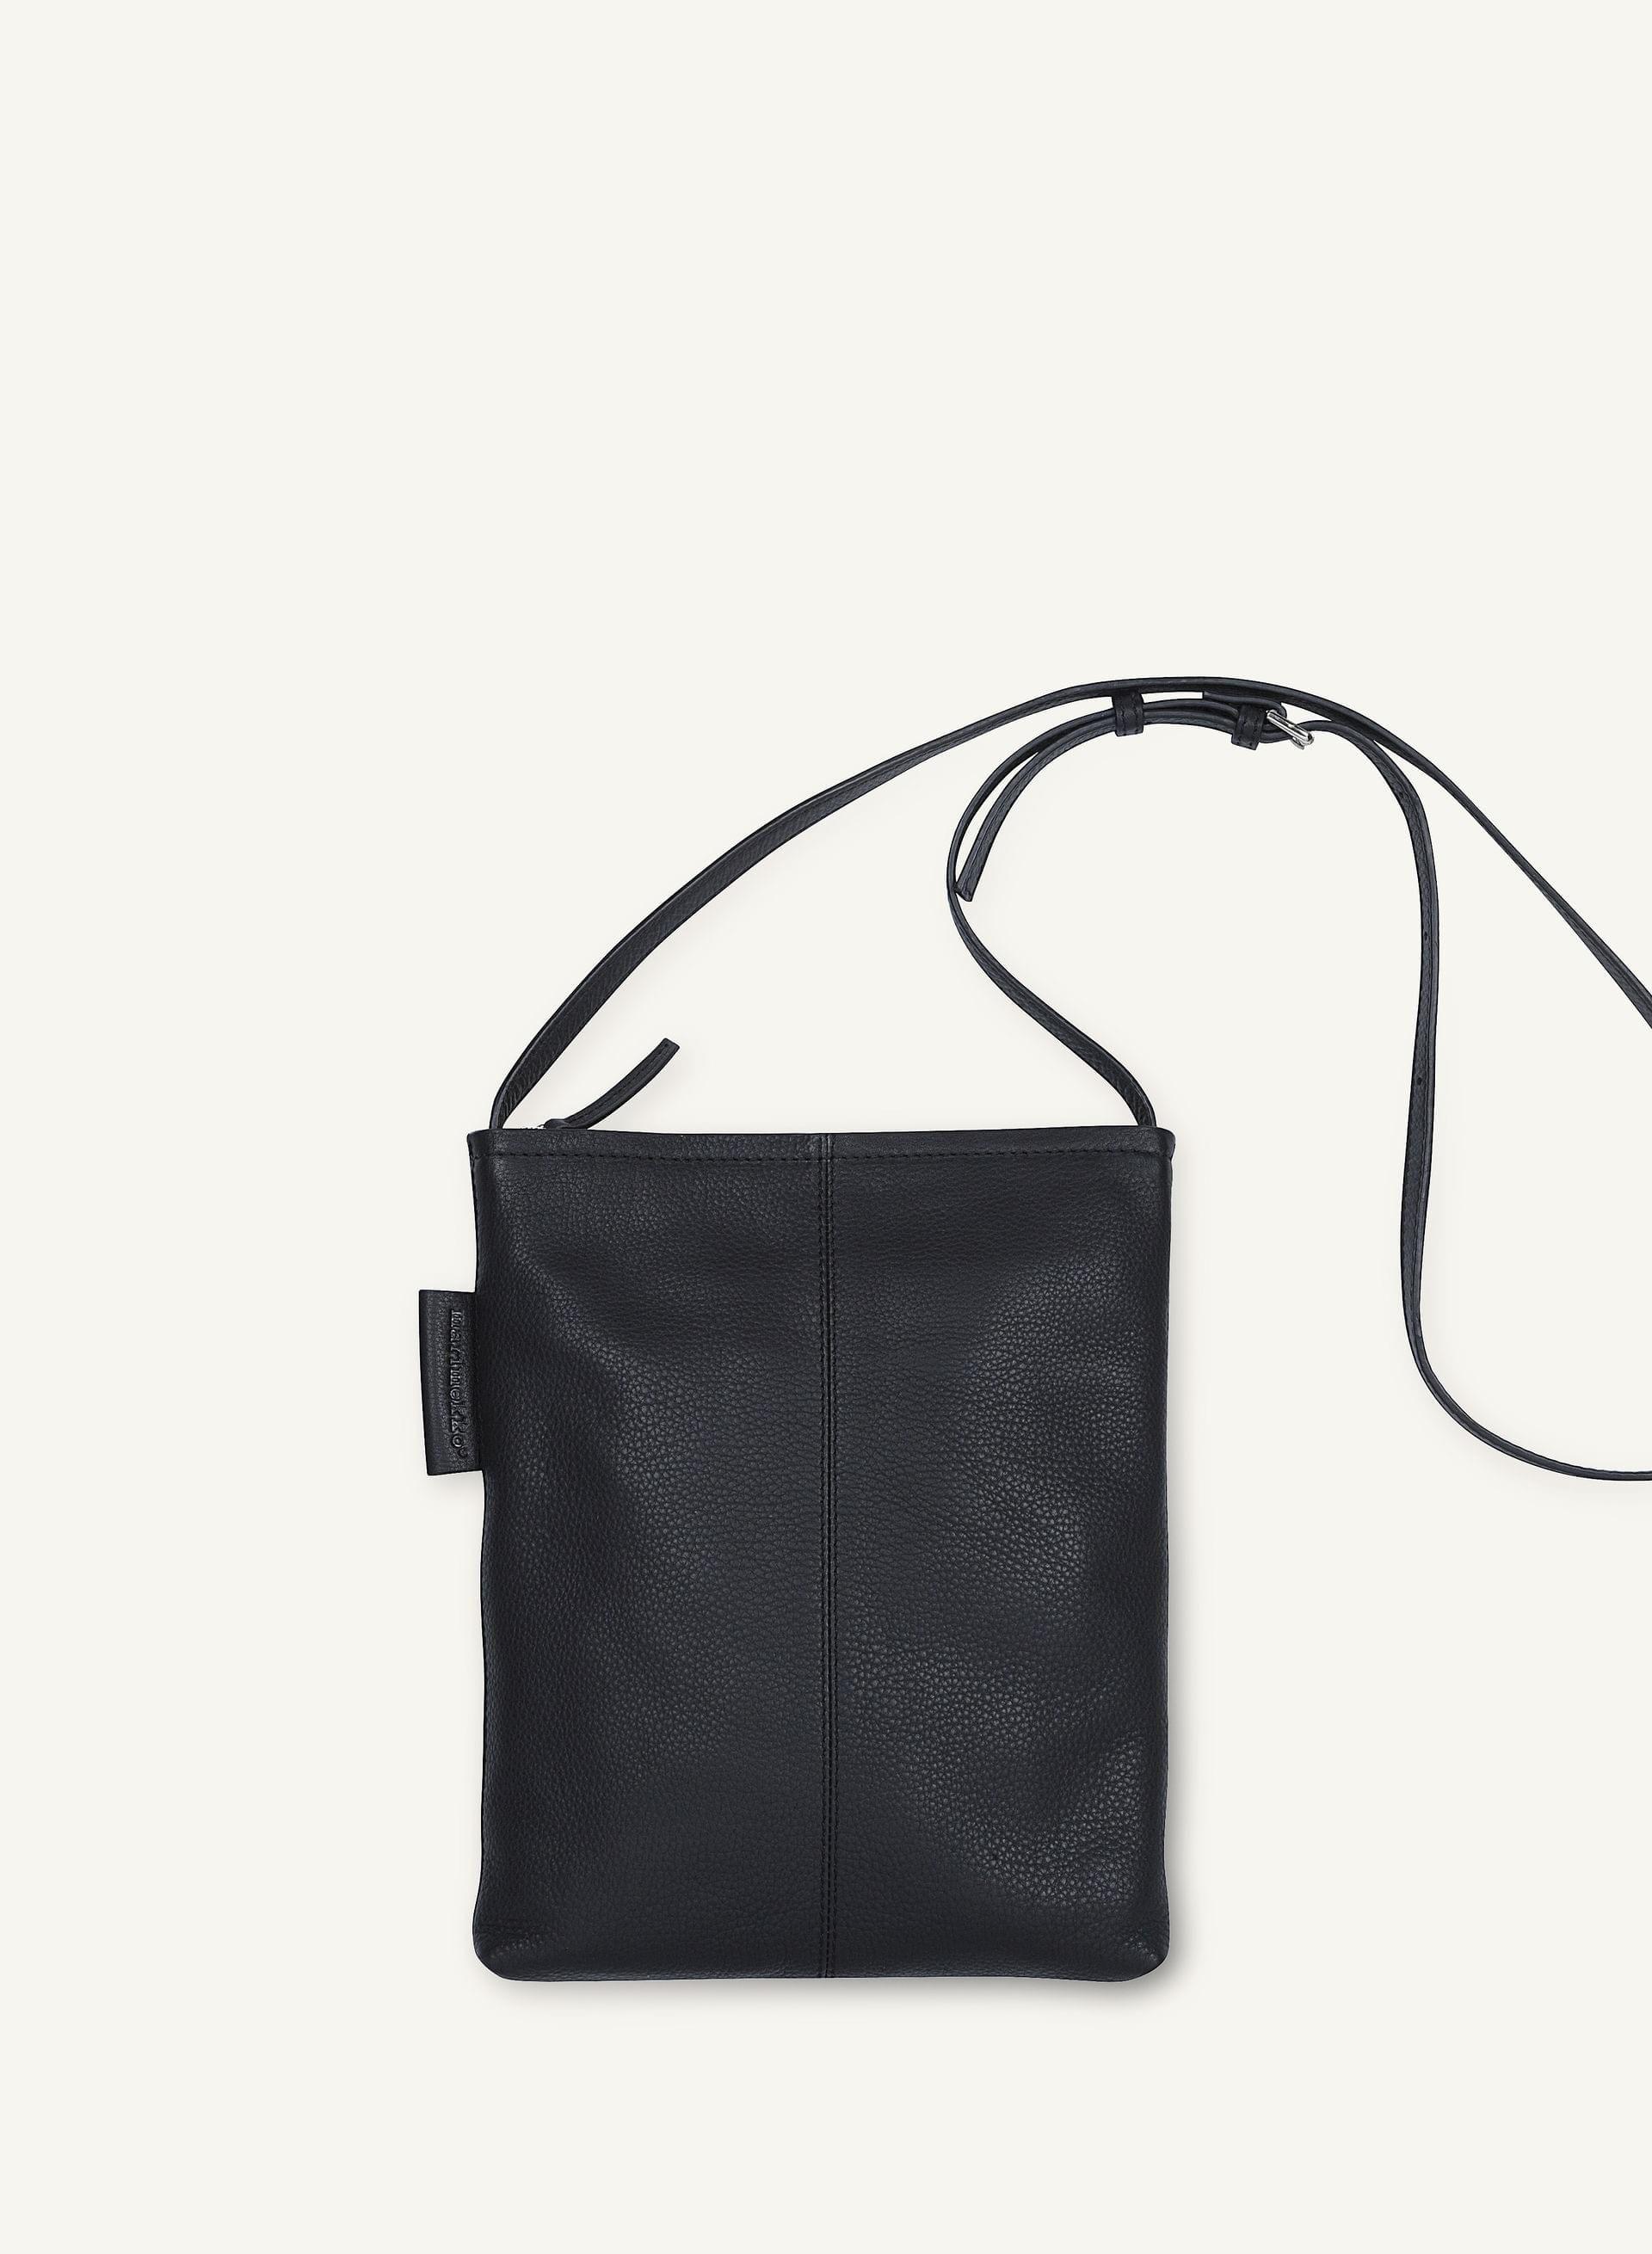 Serkku Laukku Ja MarimekkoLaukut Marimekko 2 fashion Bags Prints XOZuiPk